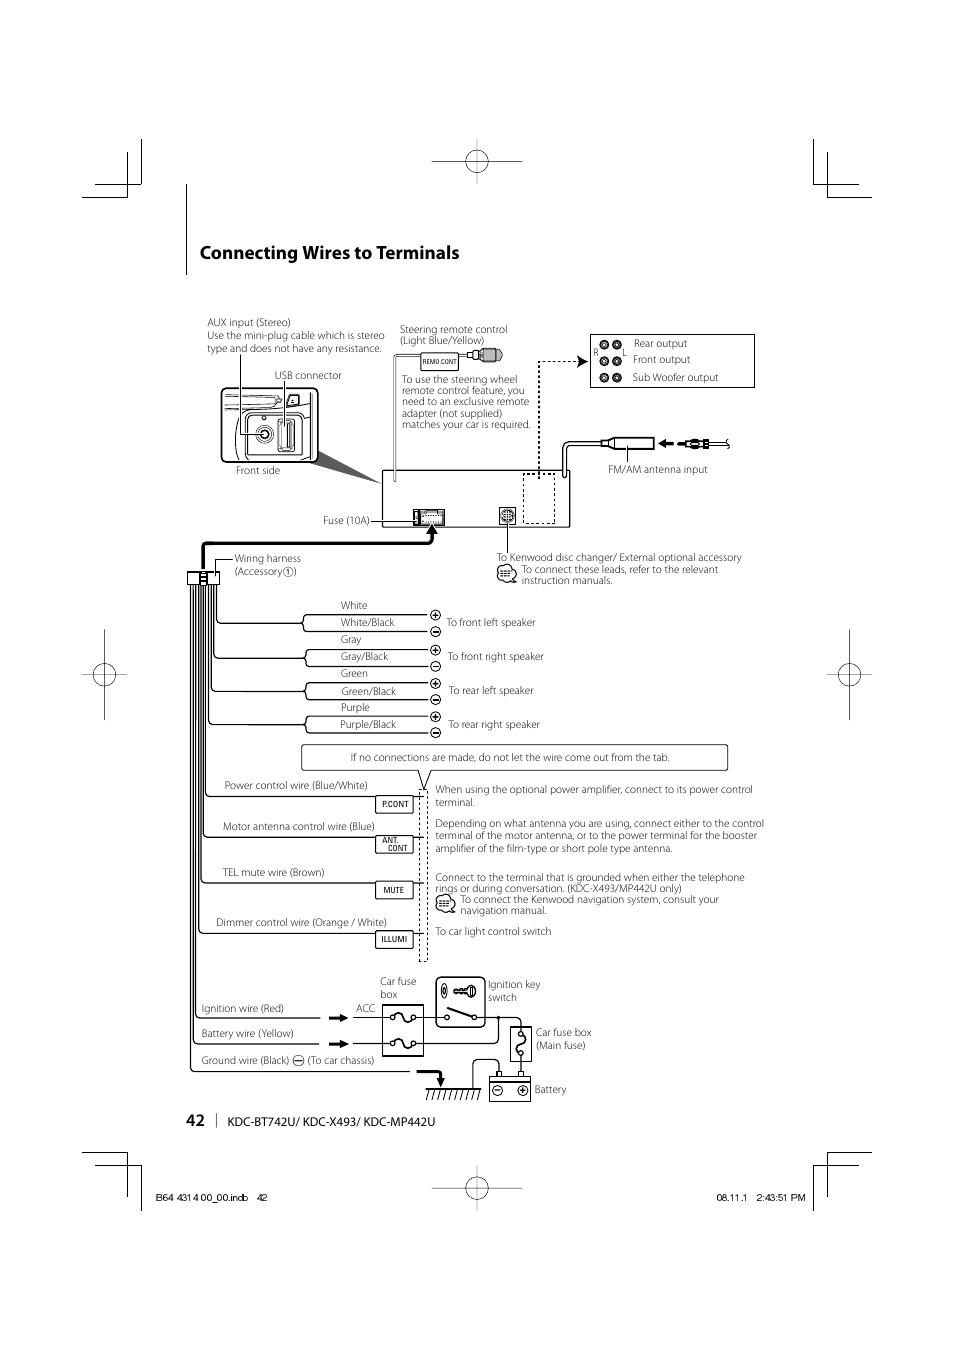 kenwood kdc bt742u page42?resize\\\\\=665%2C940 ebac bd150 wiring diagram boat wiring diagram \u2022 wiring diagram  at bakdesigns.co